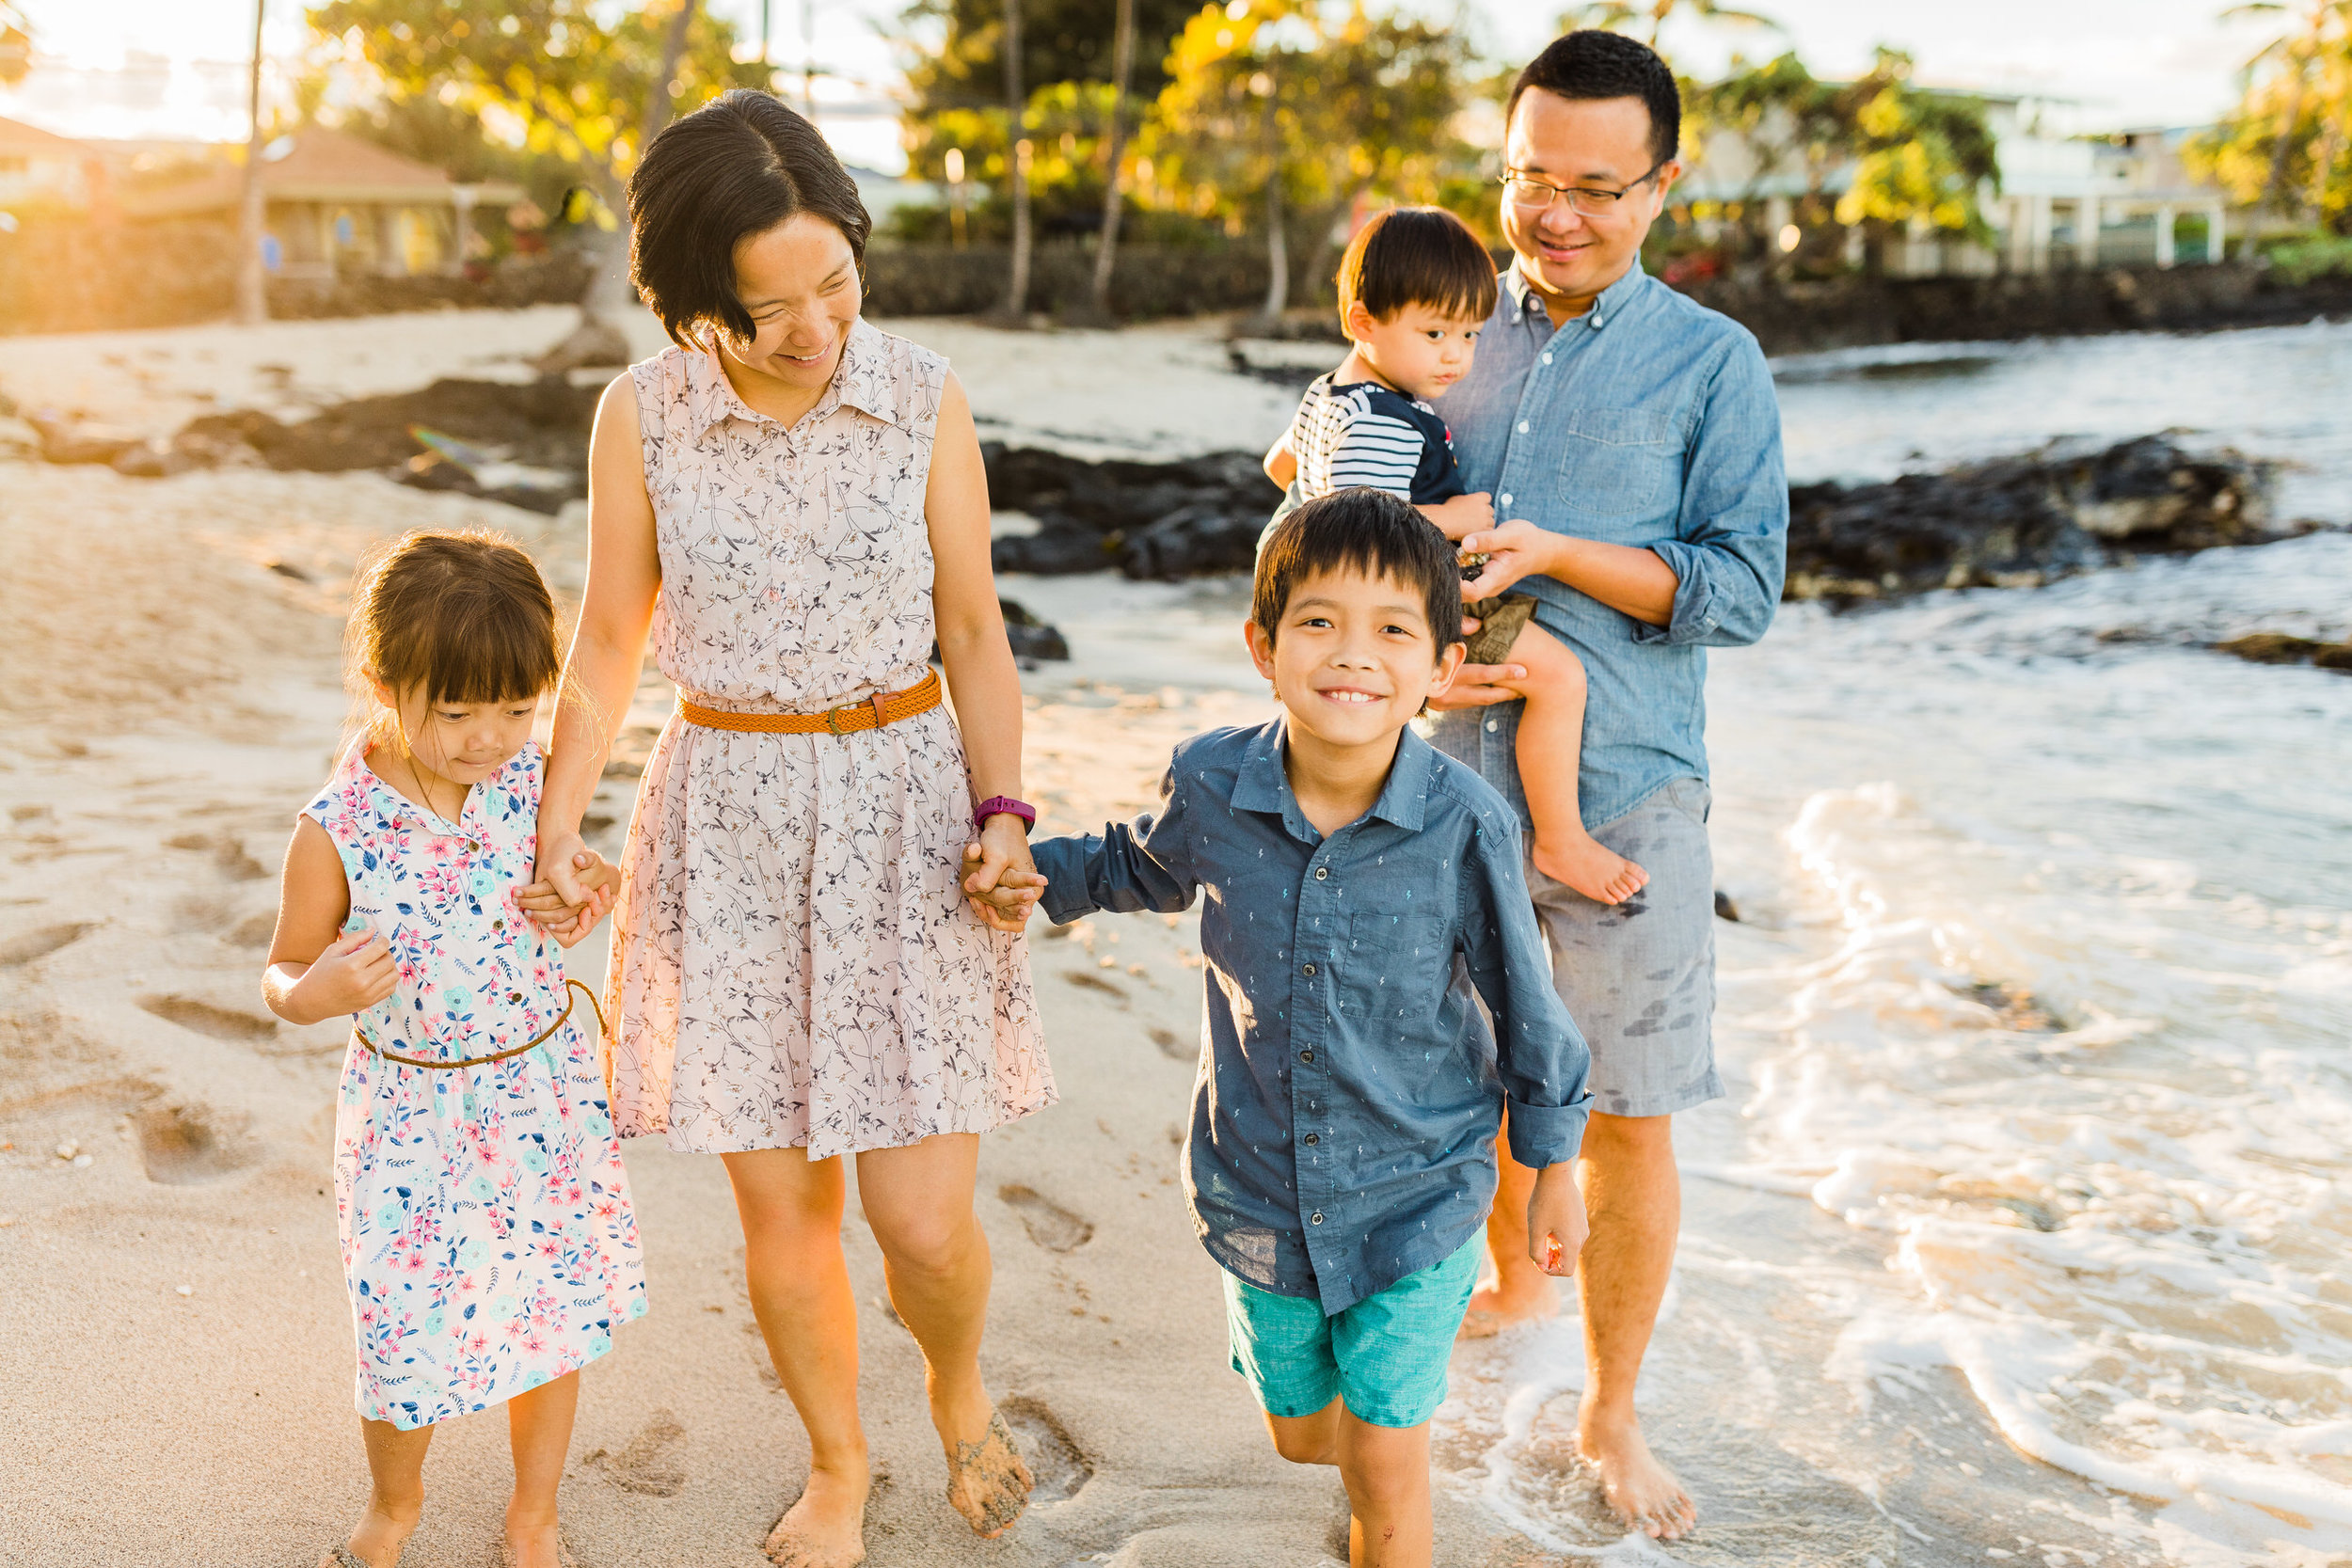 extended-family-kona-kailua-birthday-2-21.jpg